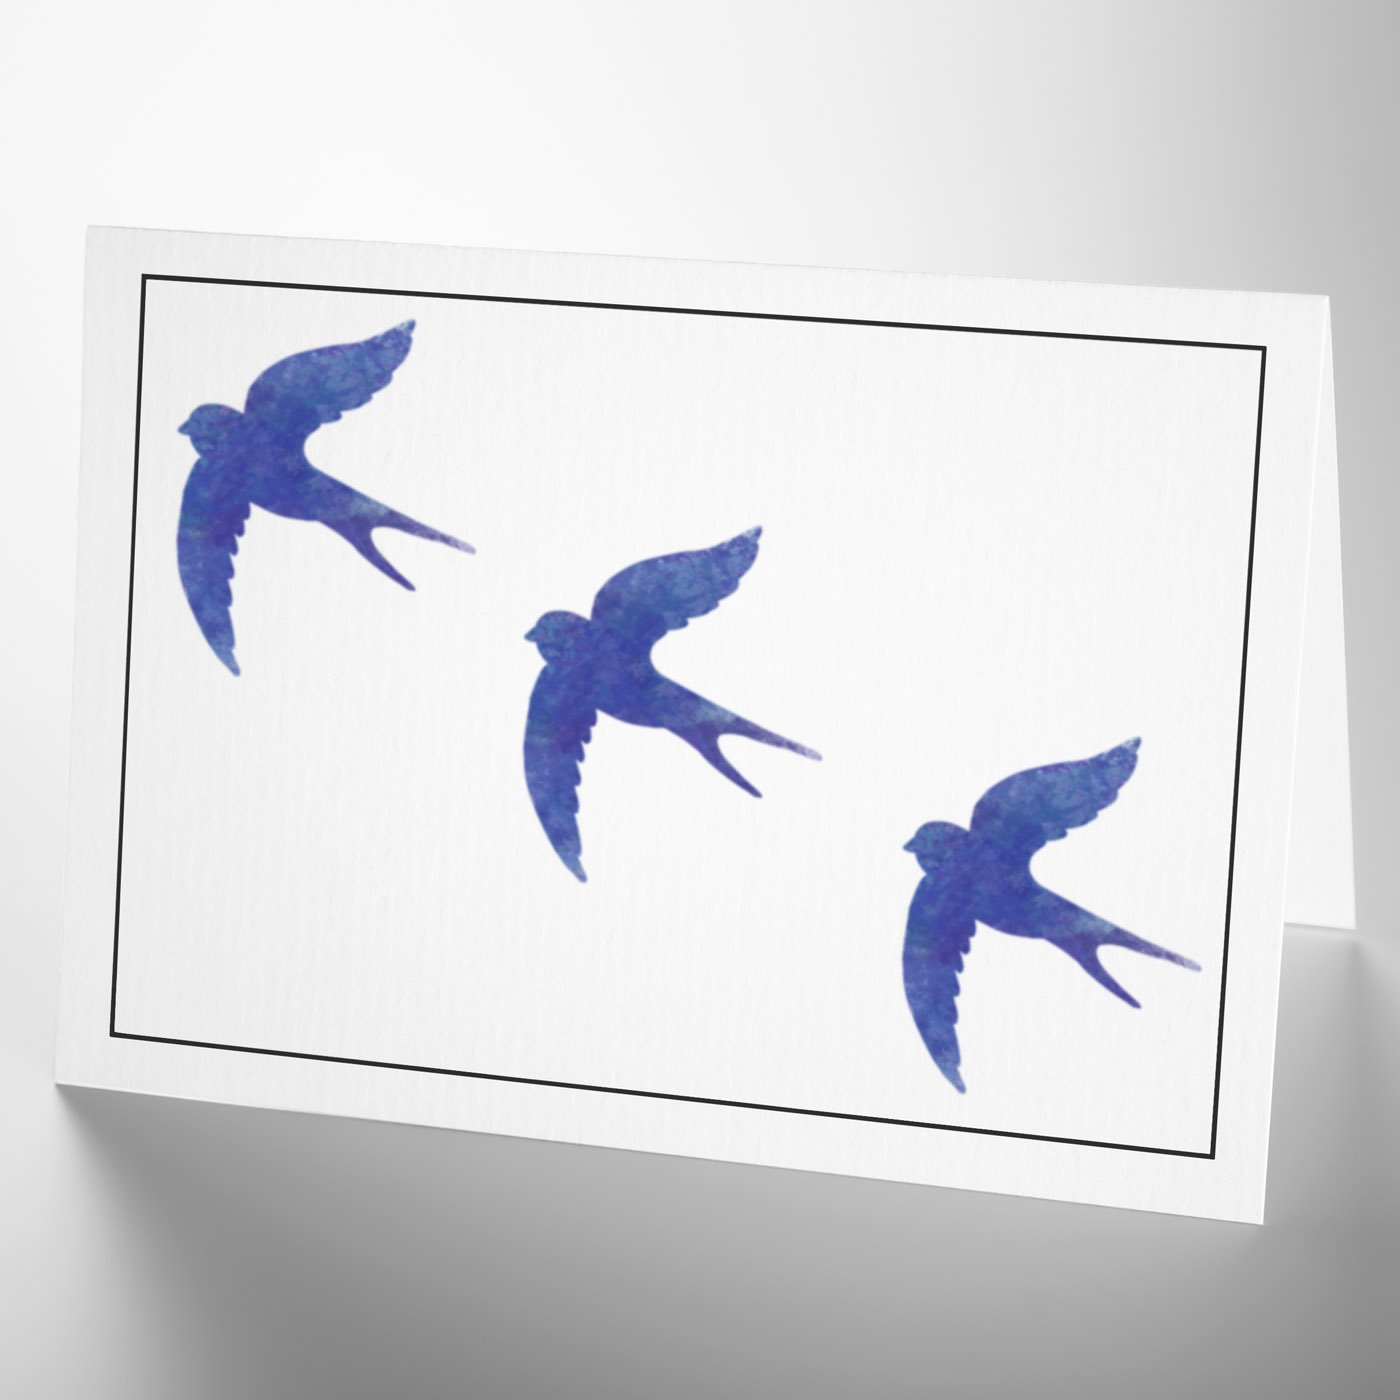 Craftstar Swallows Stencil A4 Reusable Swallow Stencil Sheet